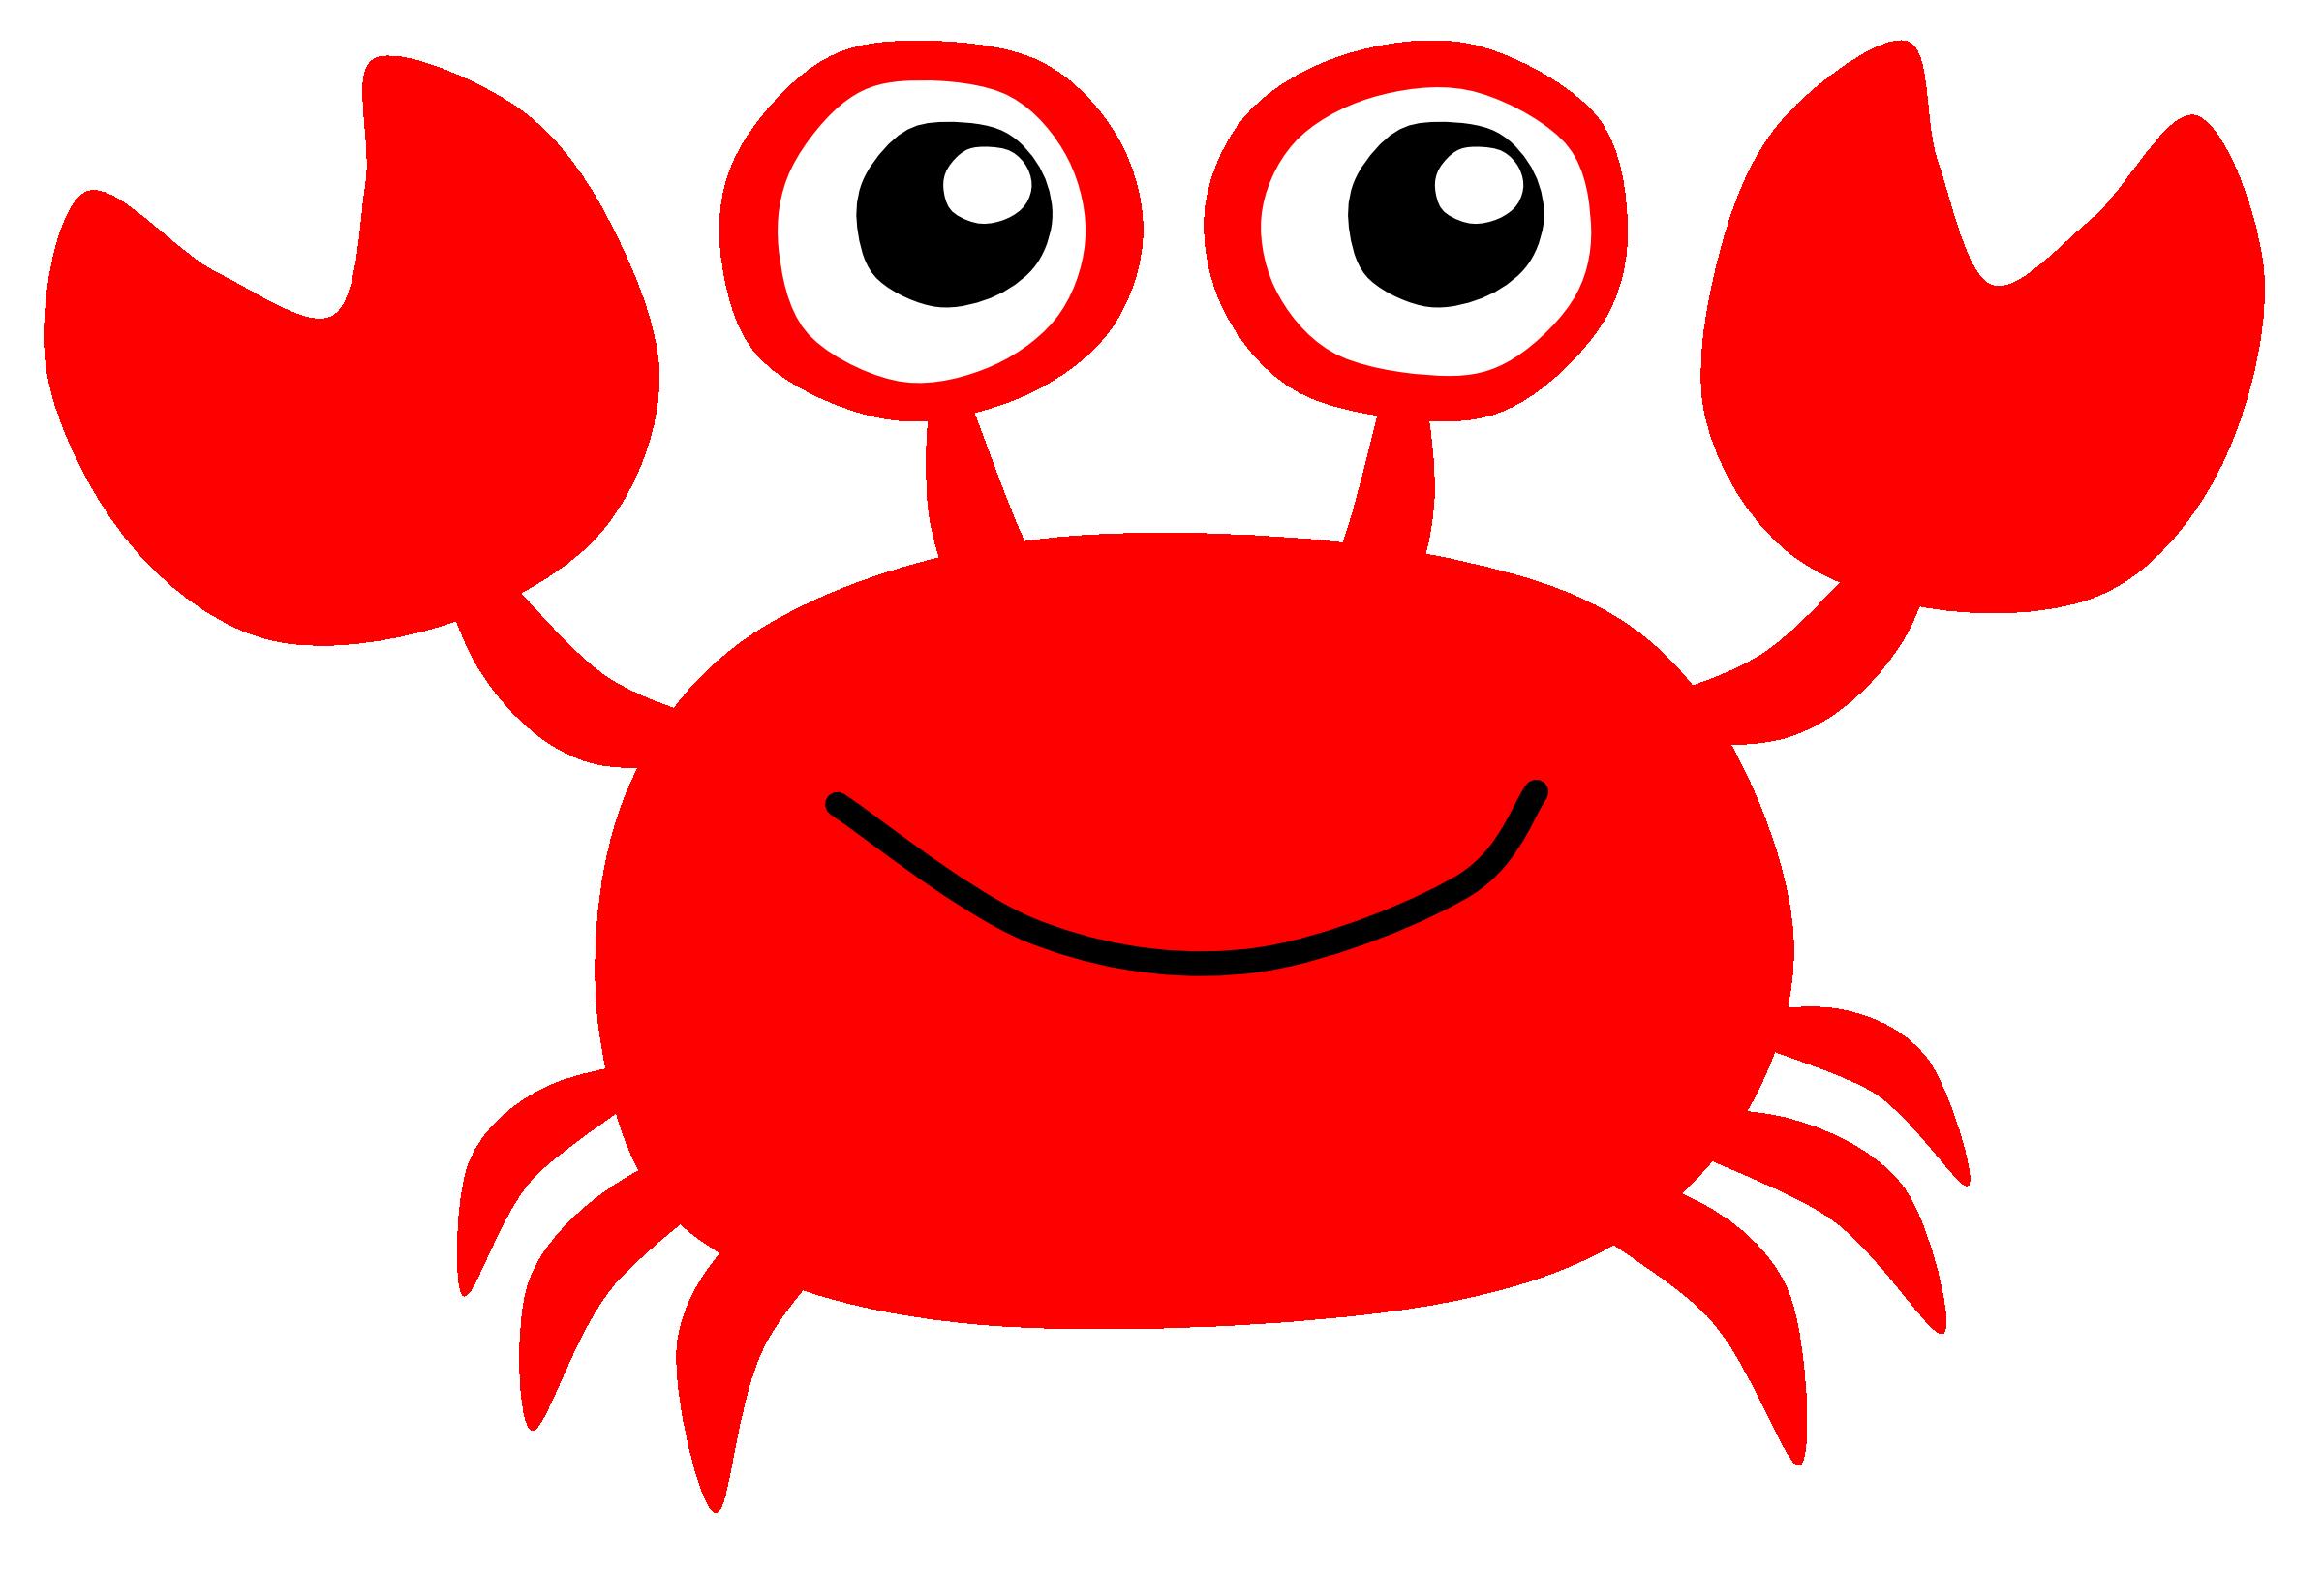 Crab Clipart | Clipart Panda - Free Clipart Images